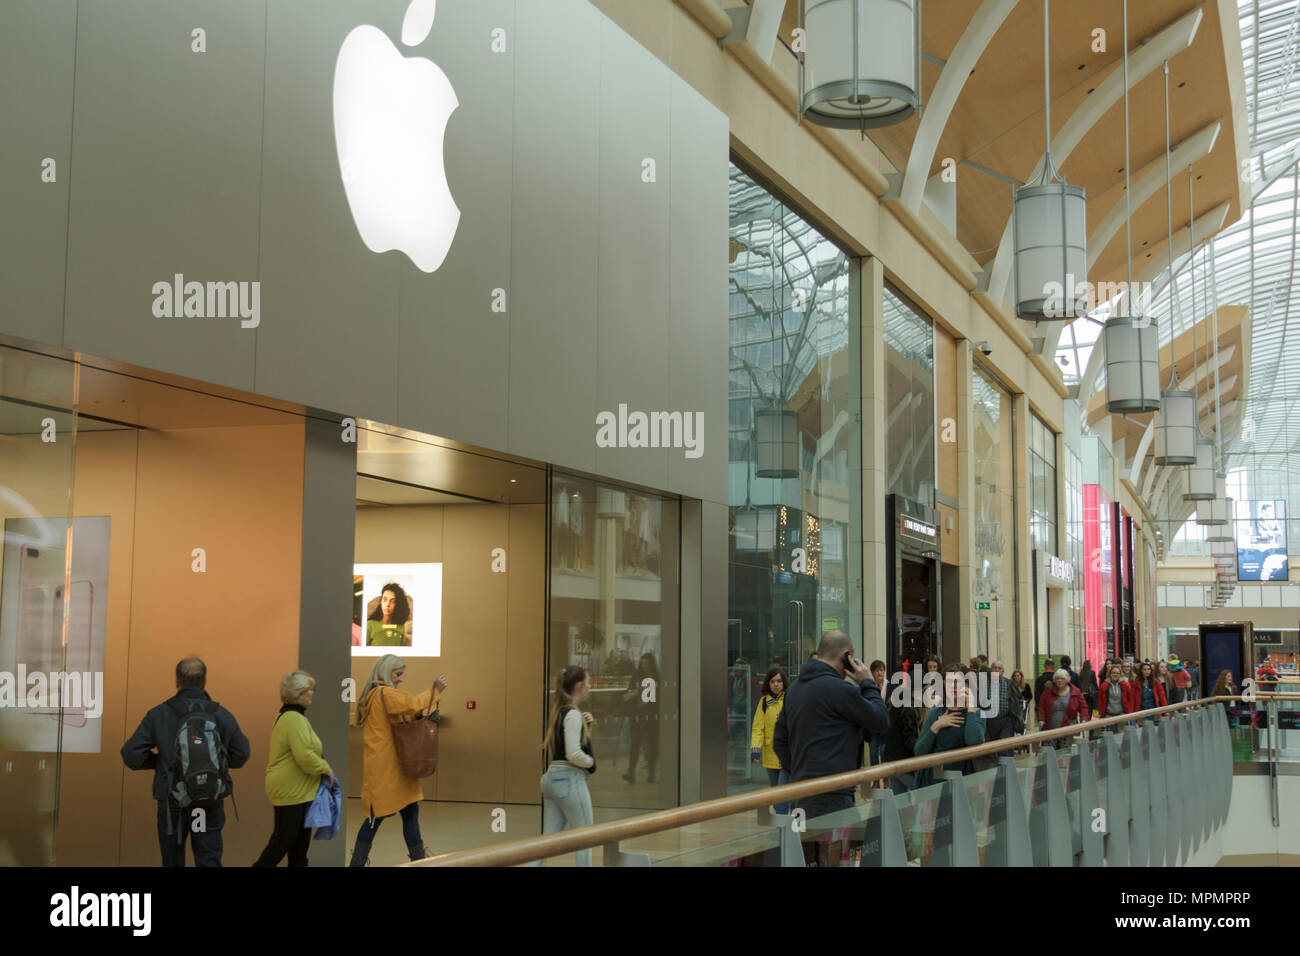 Apple Store, St David's Shopping Centre, Cardiff, UK  April 13th